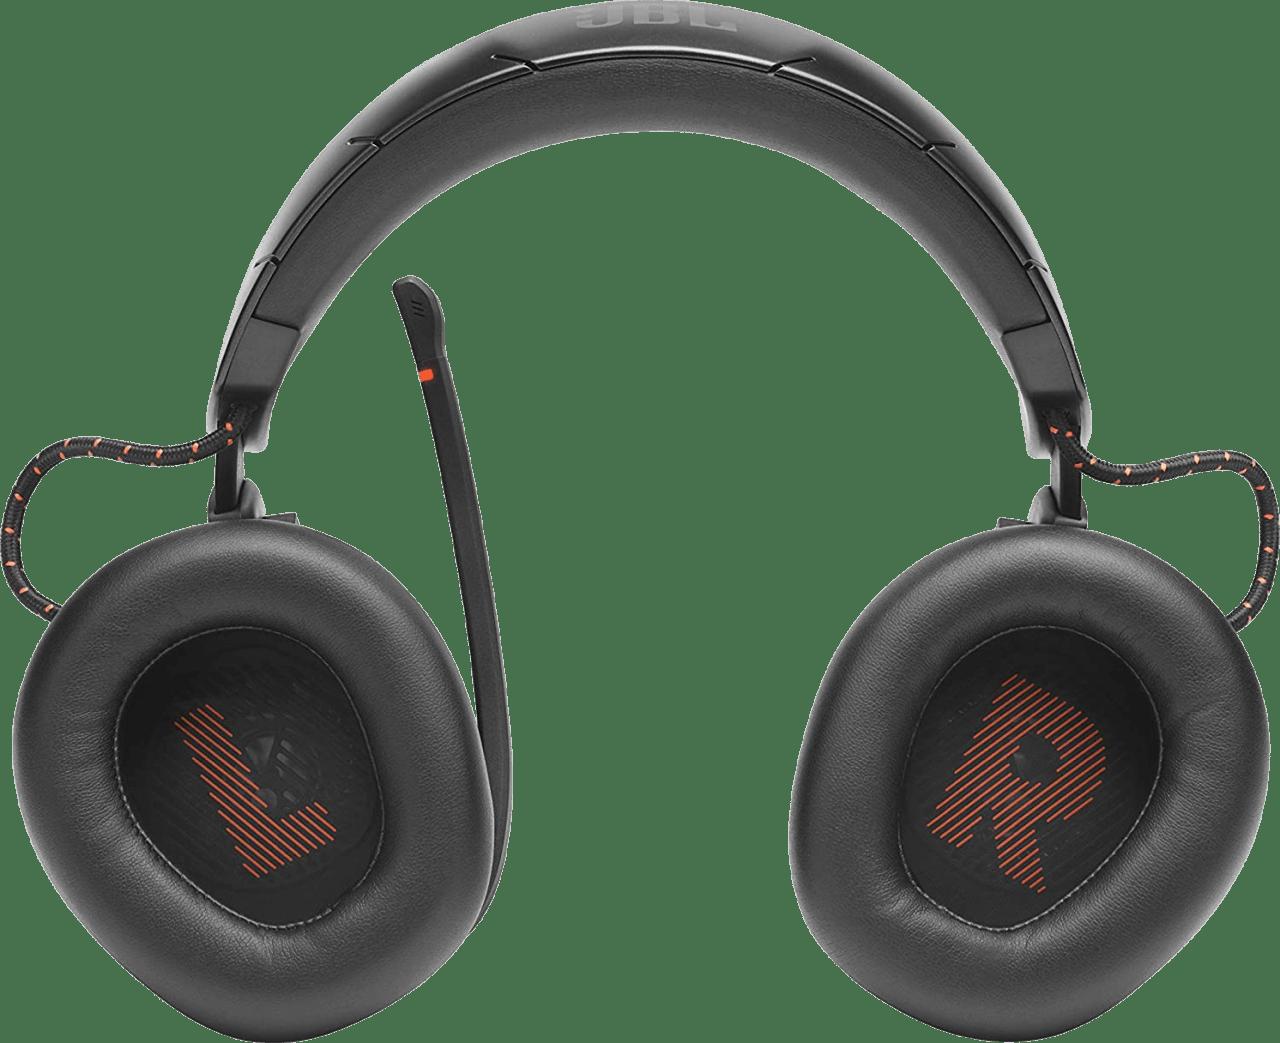 Black JBL Quantum 600 Over-ear Gaming Headphones.3